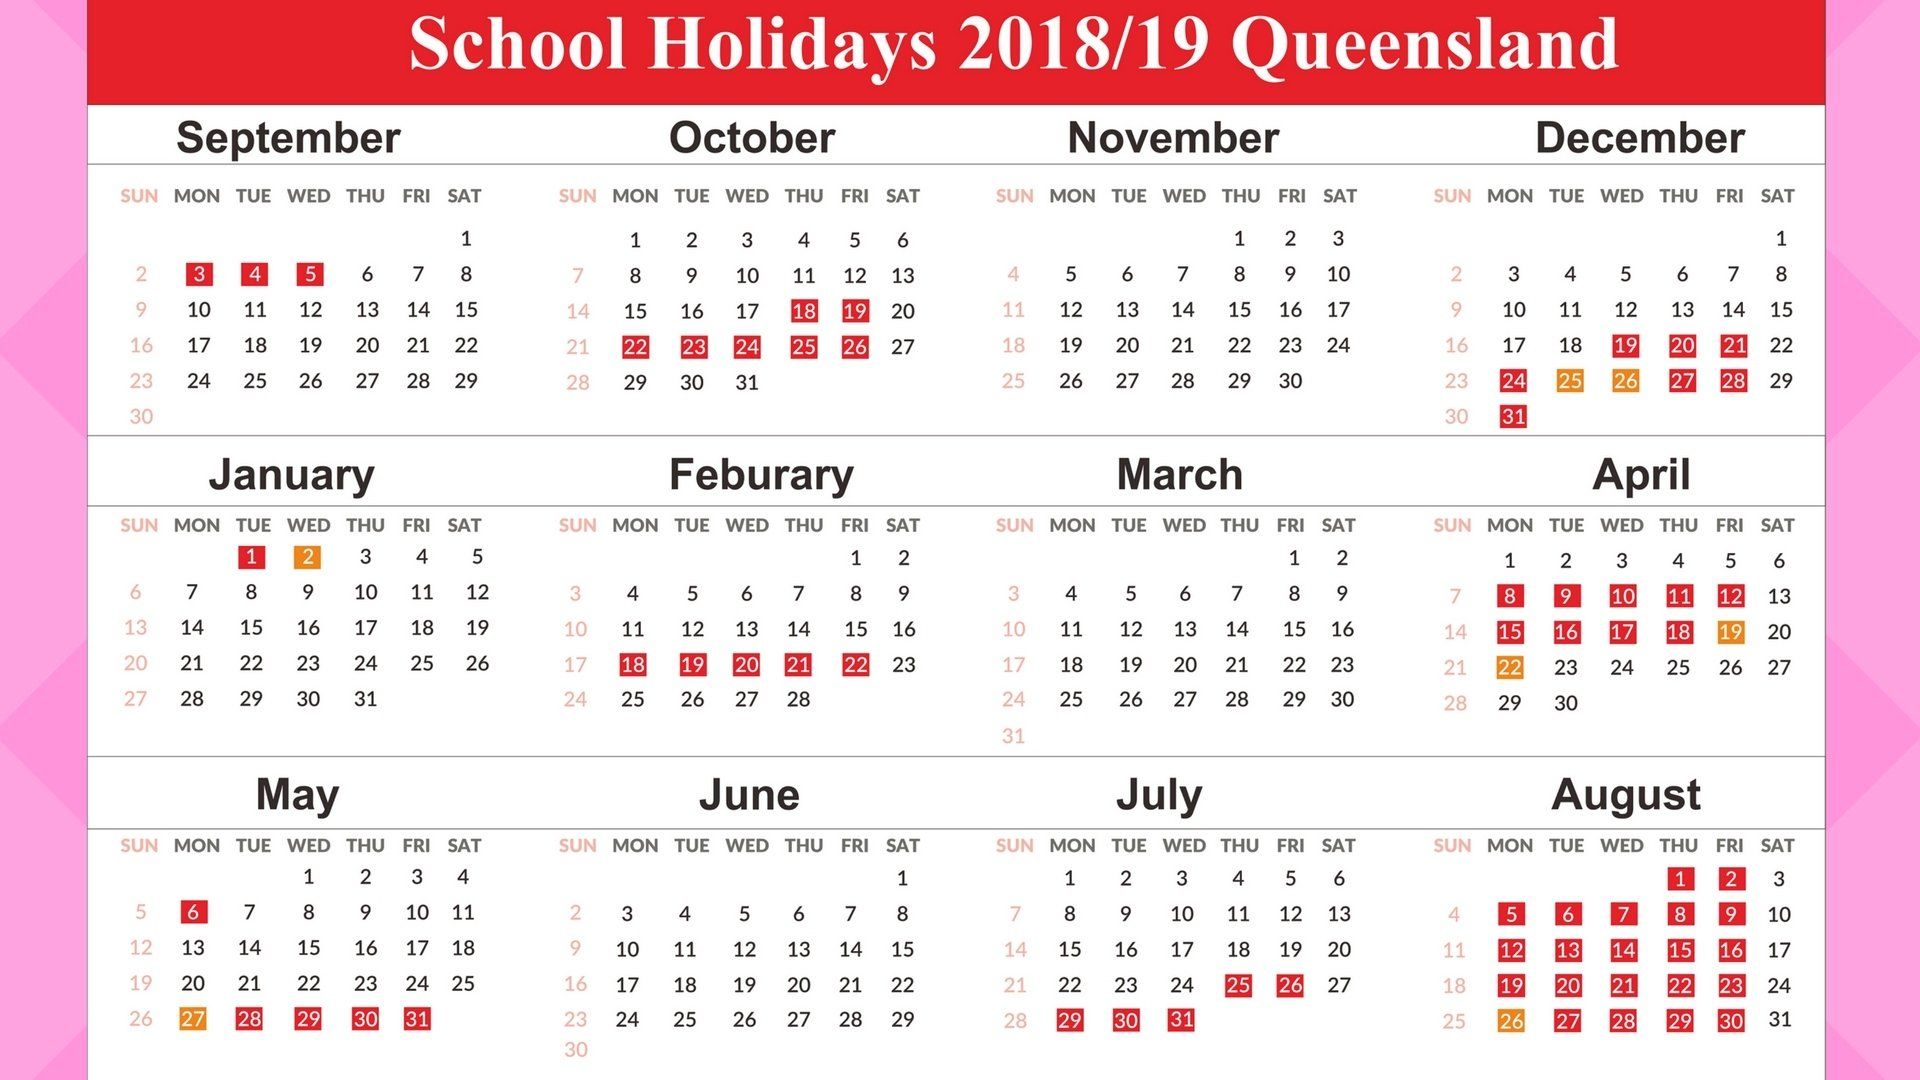 Perky School Calendar 2019 Qld • Printable Blank Calendar Template 2019 Calendar Queensland State Schools